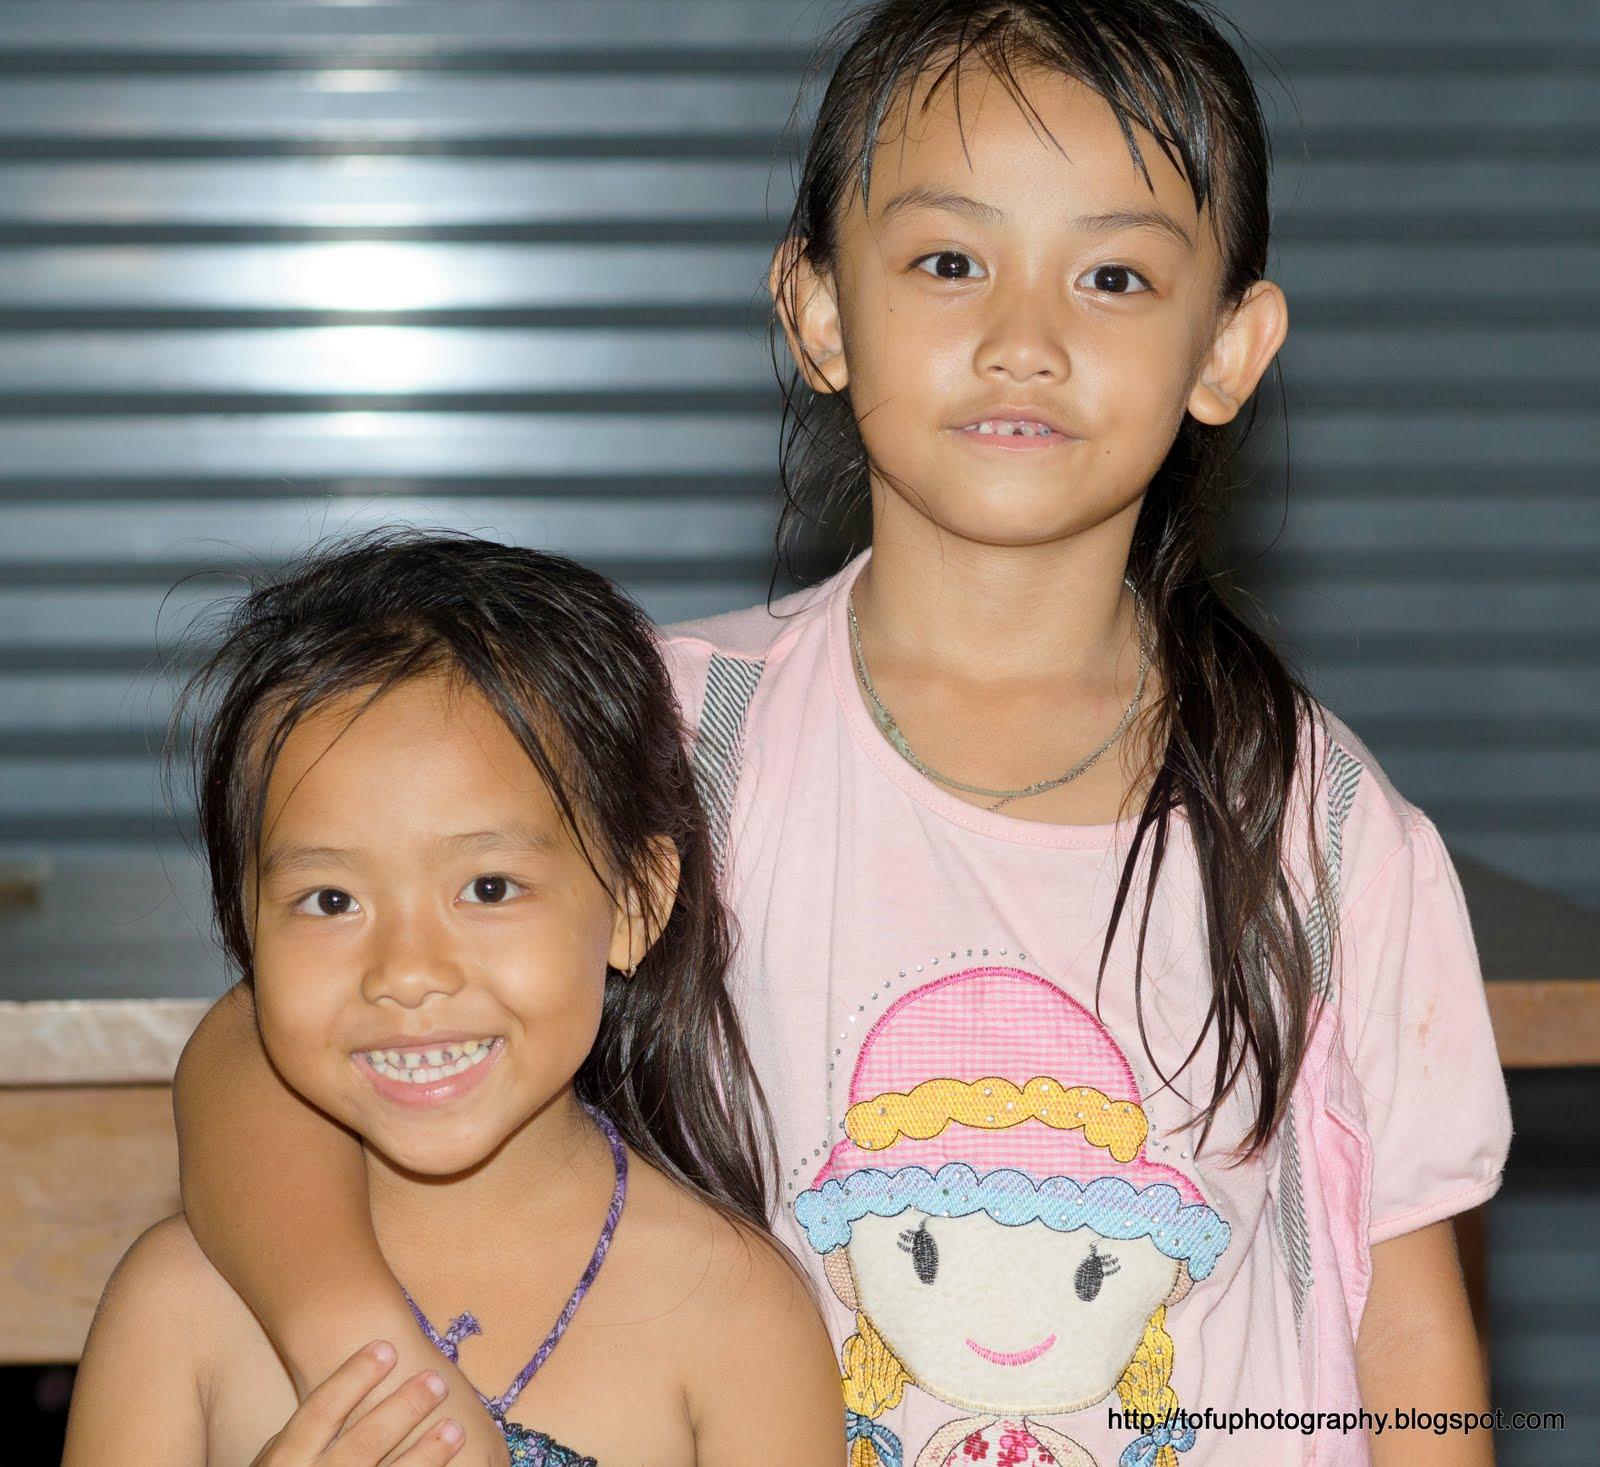 Tofu Photography: Two Thai girls